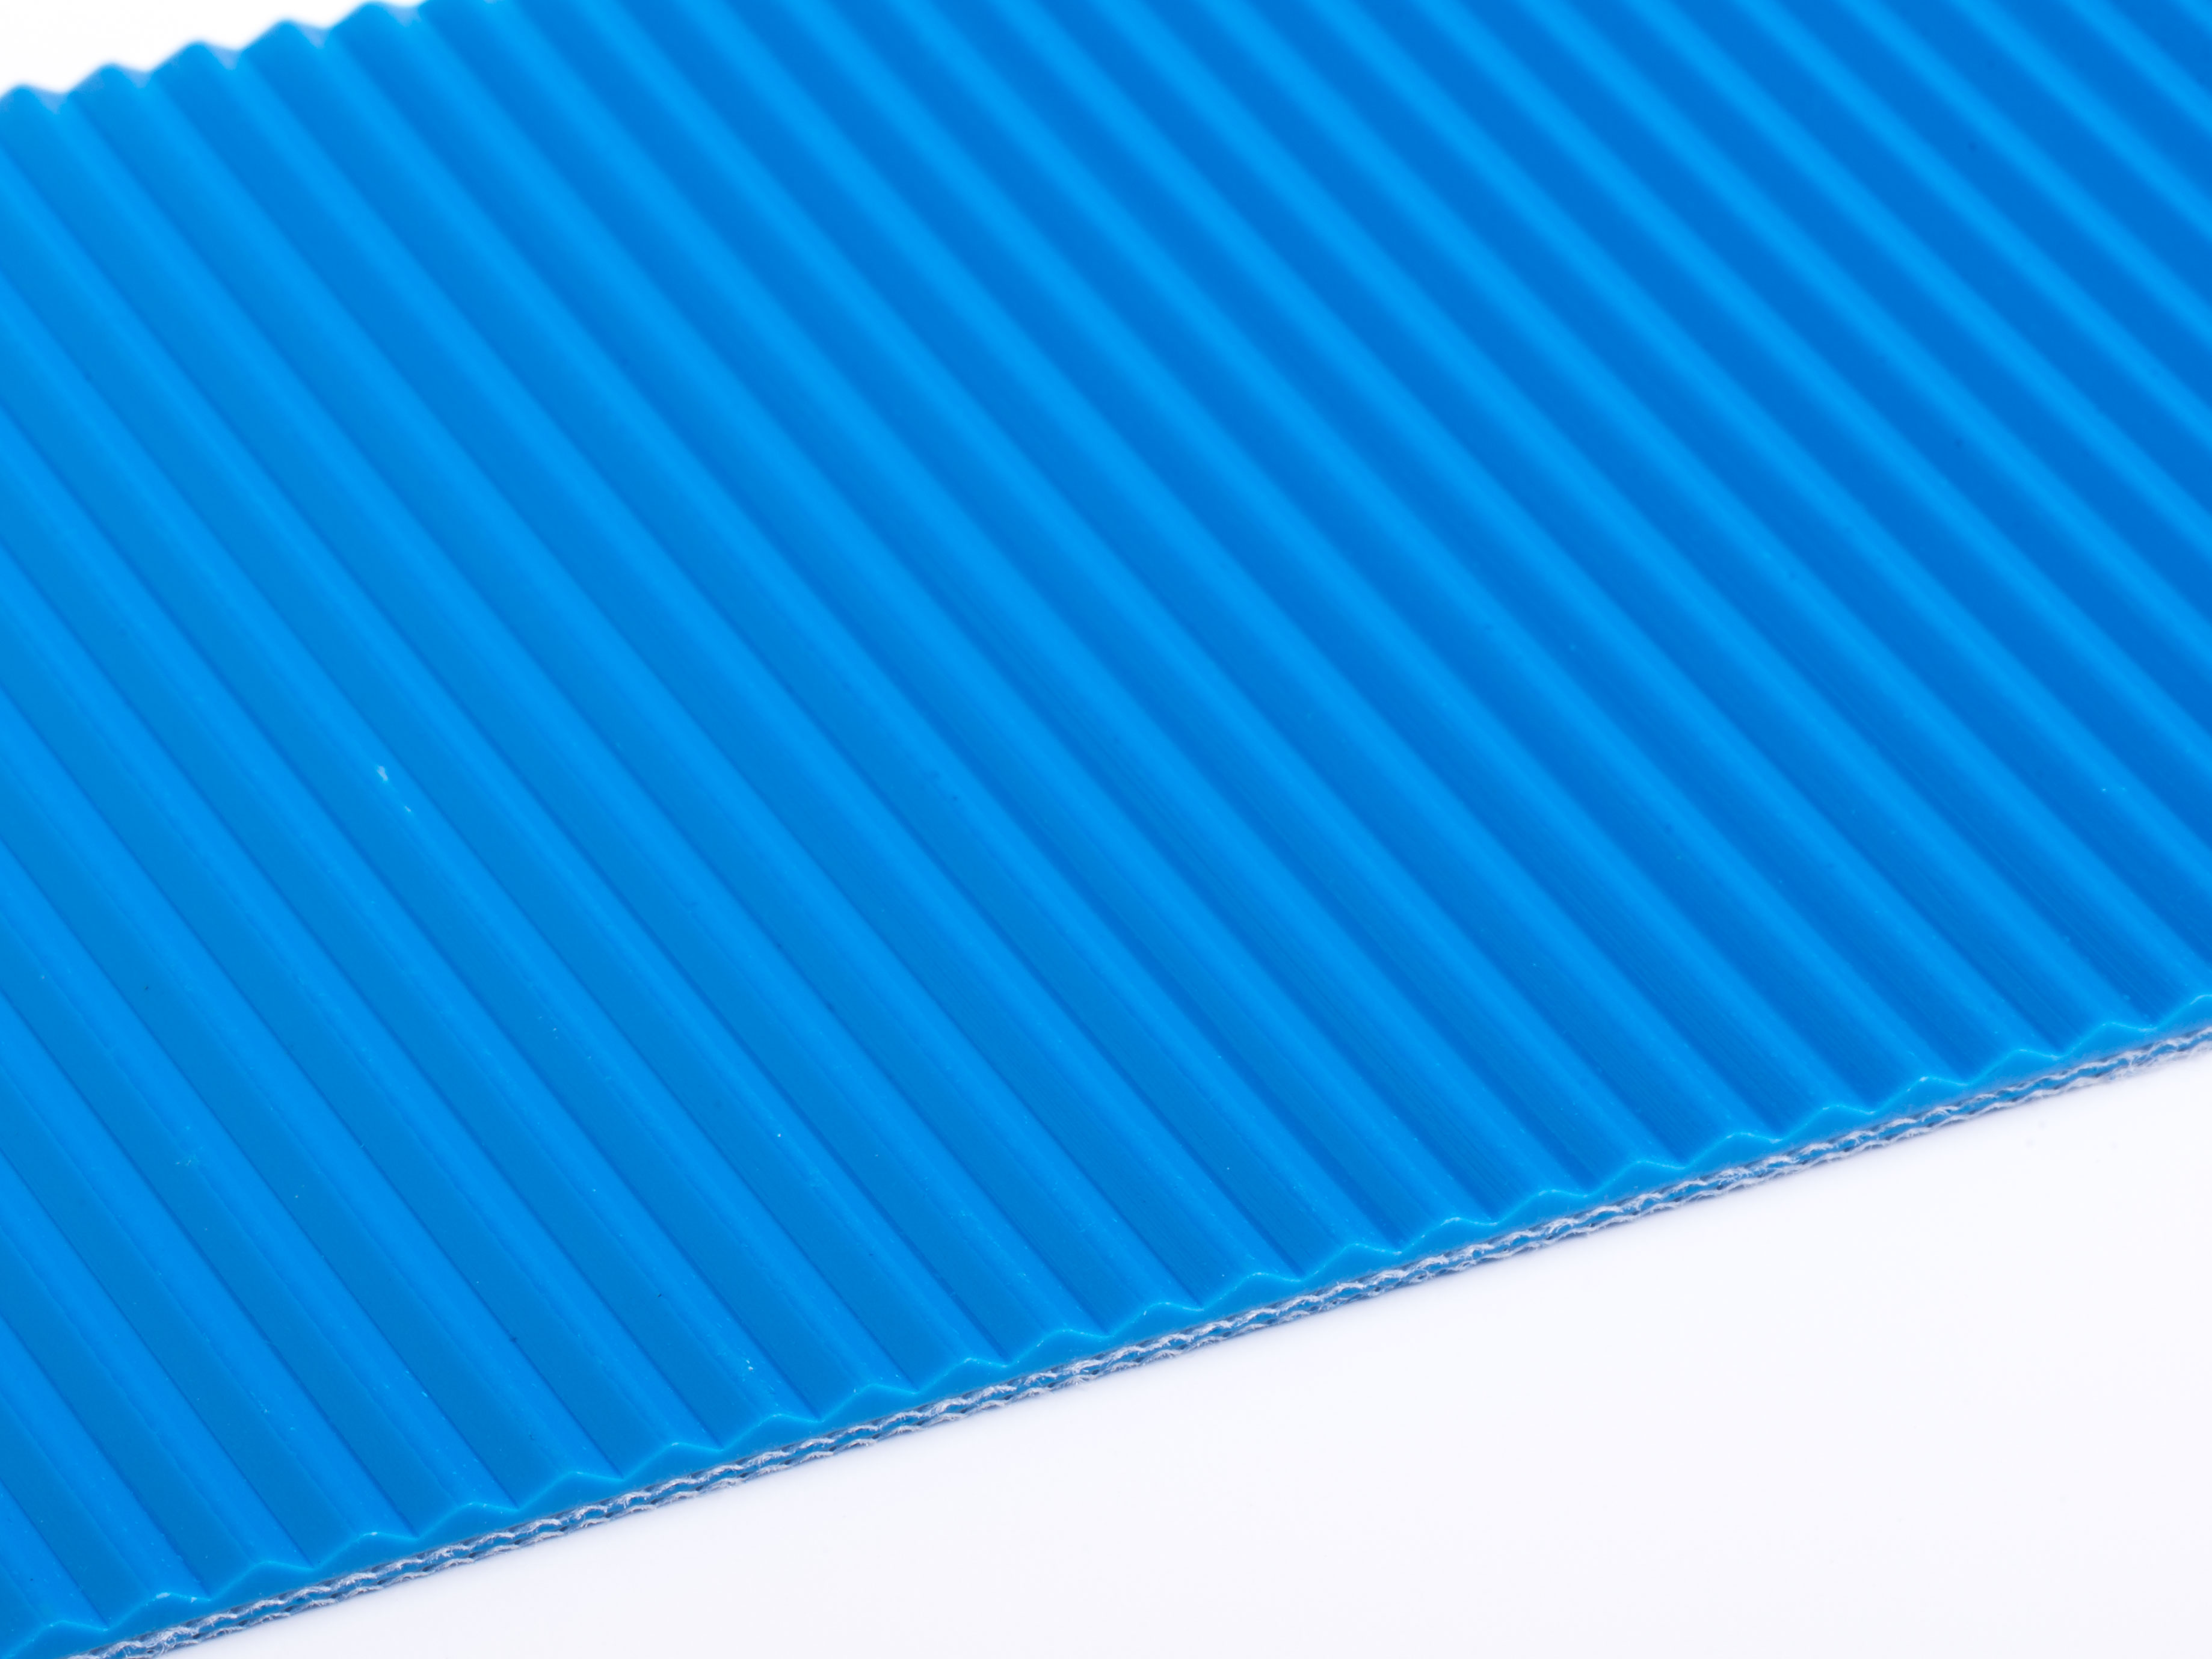 E 8/2 U0/V18 TRI blau FDA